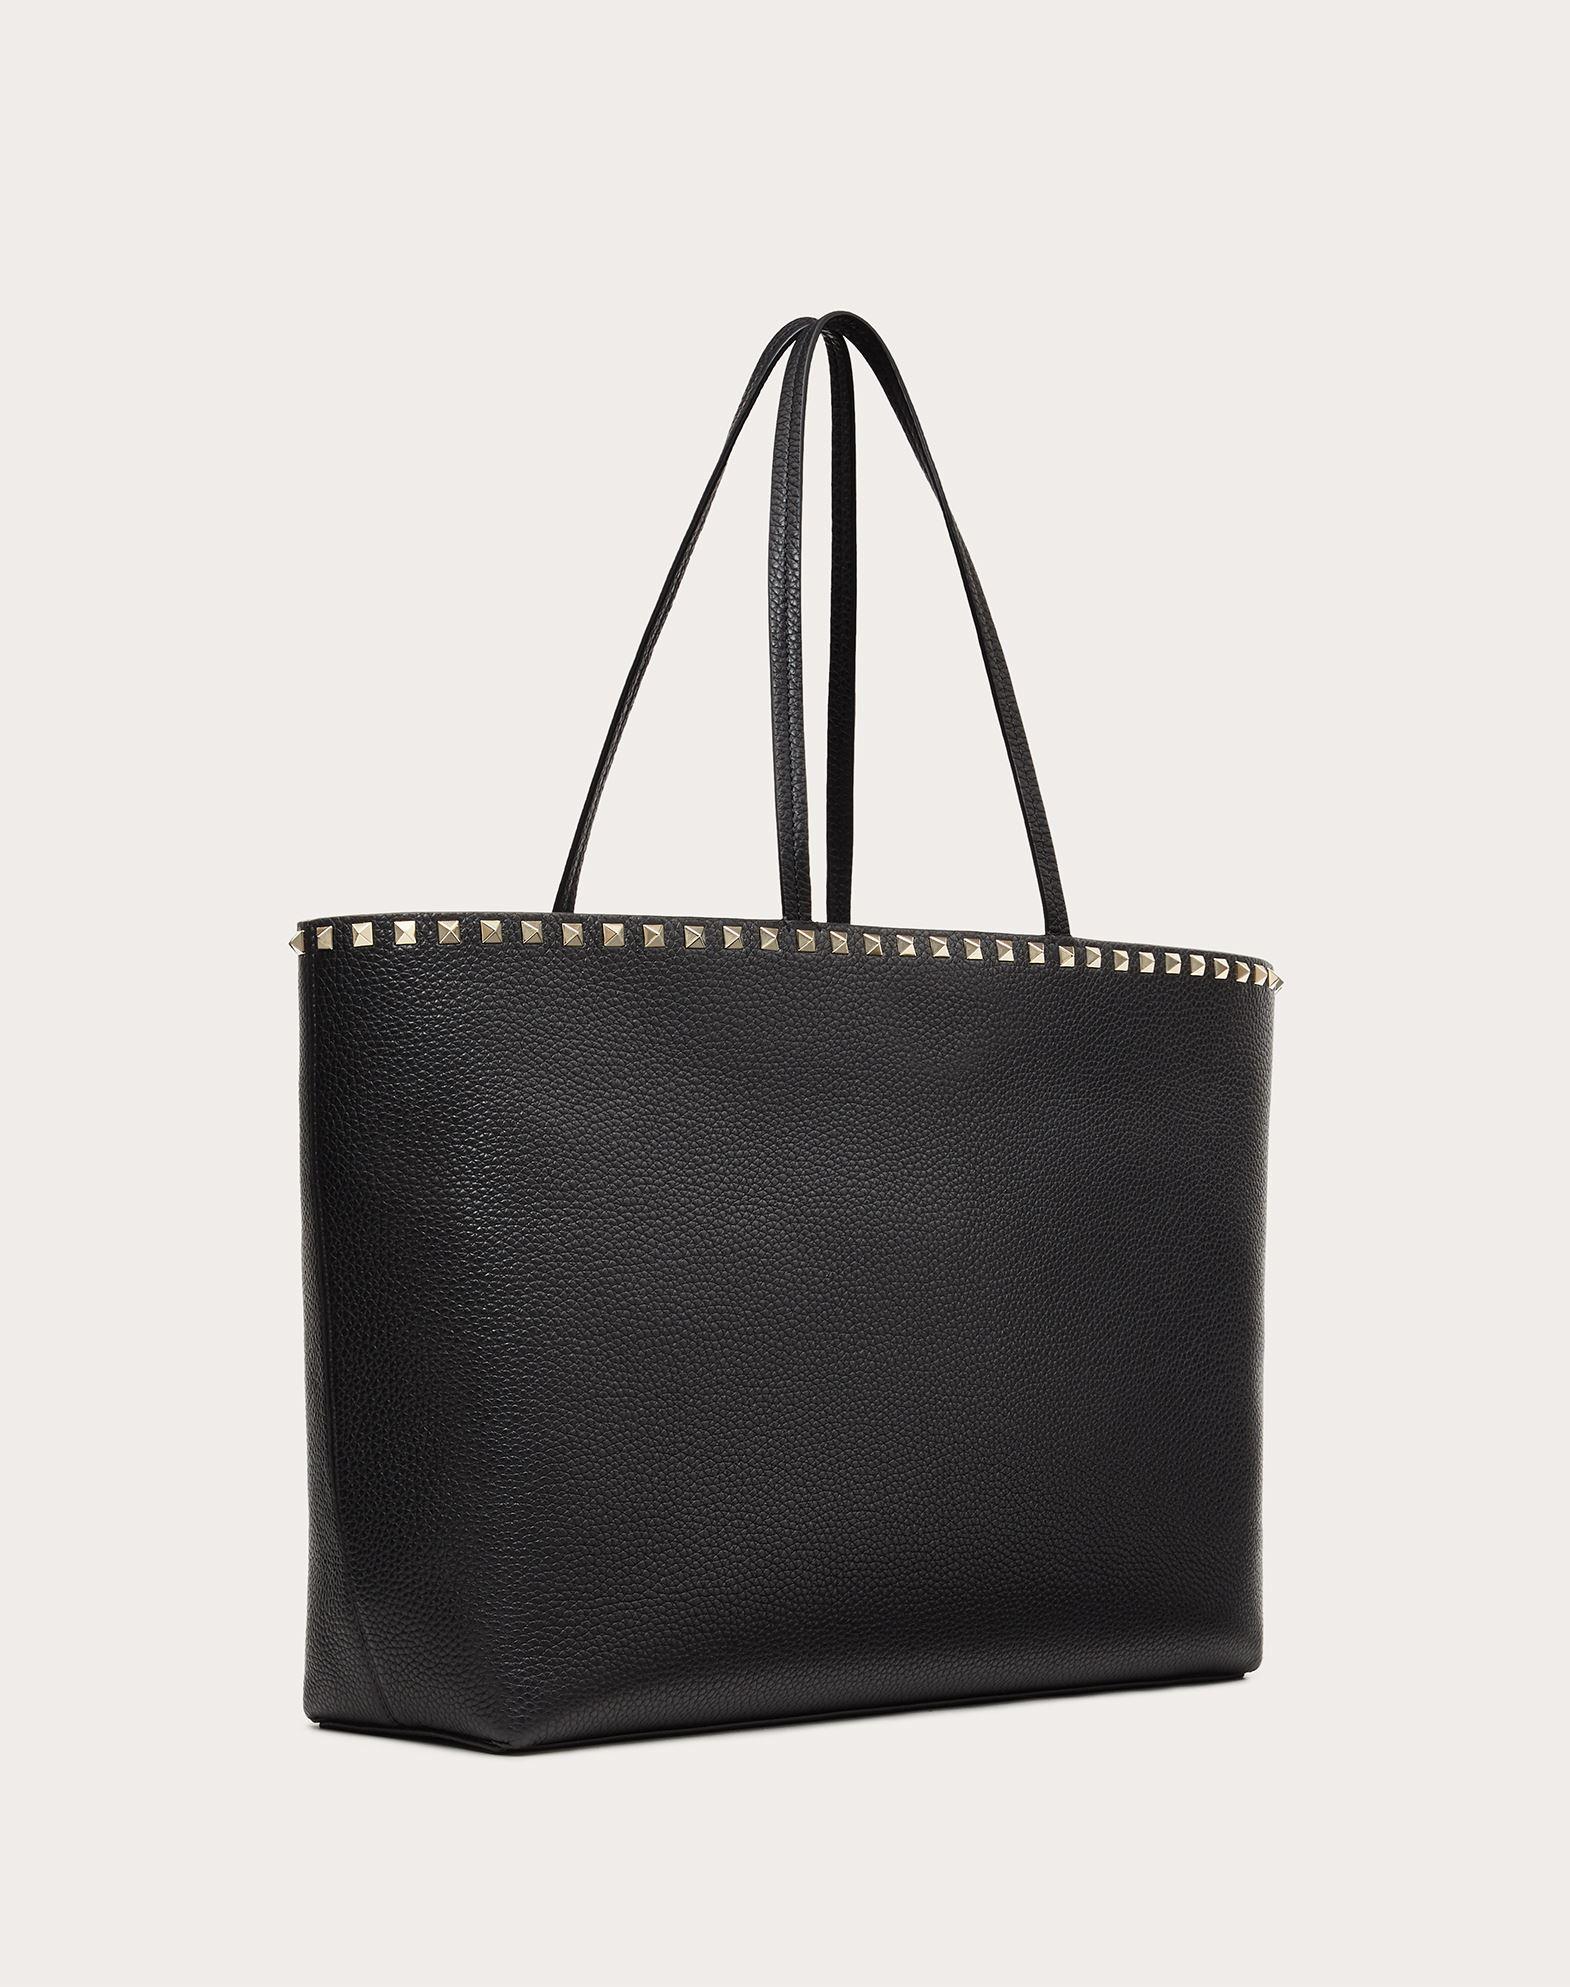 VALENTINO GARAVANI Rockstud 购物袋 Tote 手袋 D r